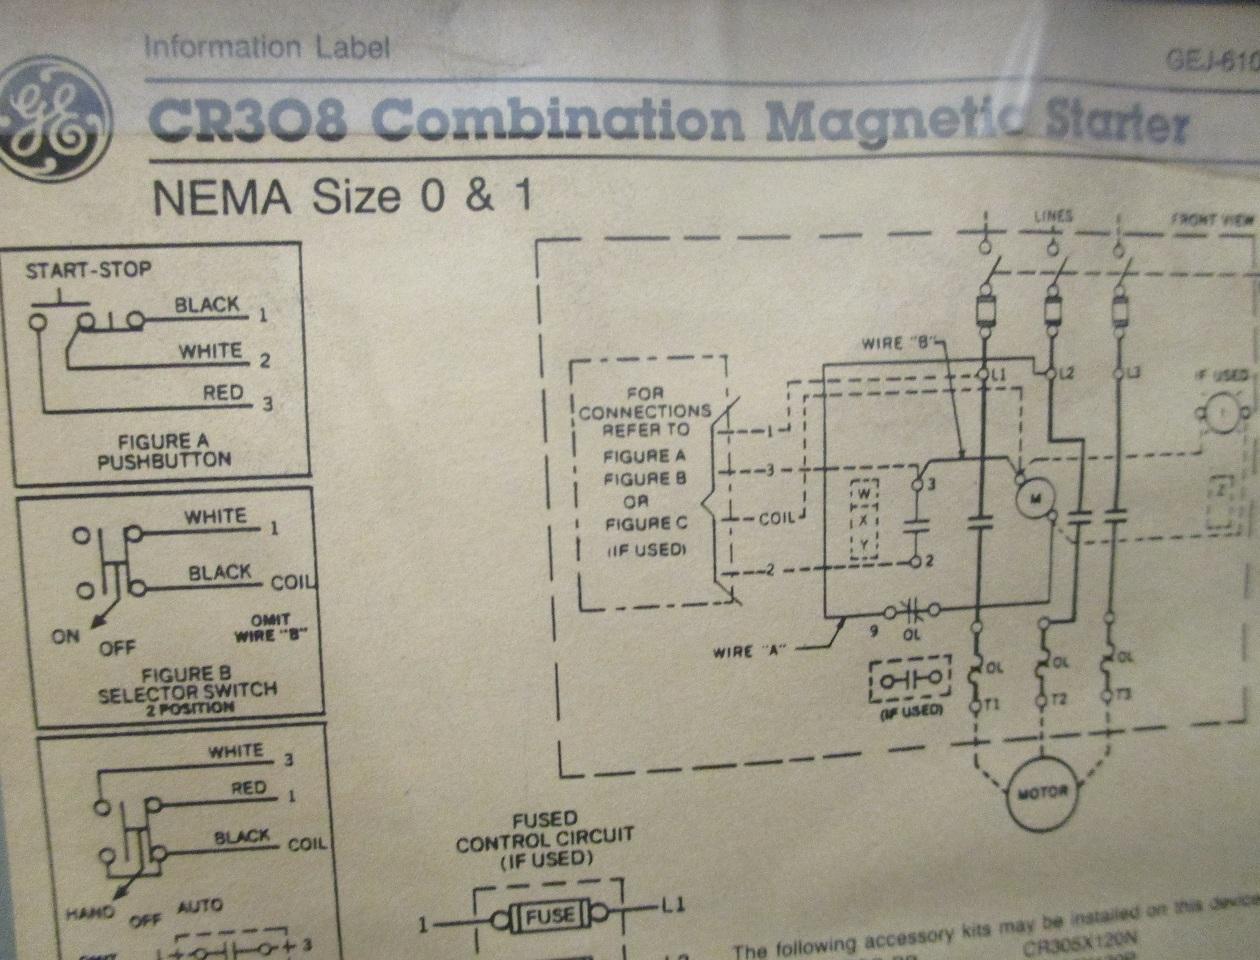 hight resolution of ge combination magnetic starter cr308 600v max complete enclosure 300 line control square d motor starter wiring diagram